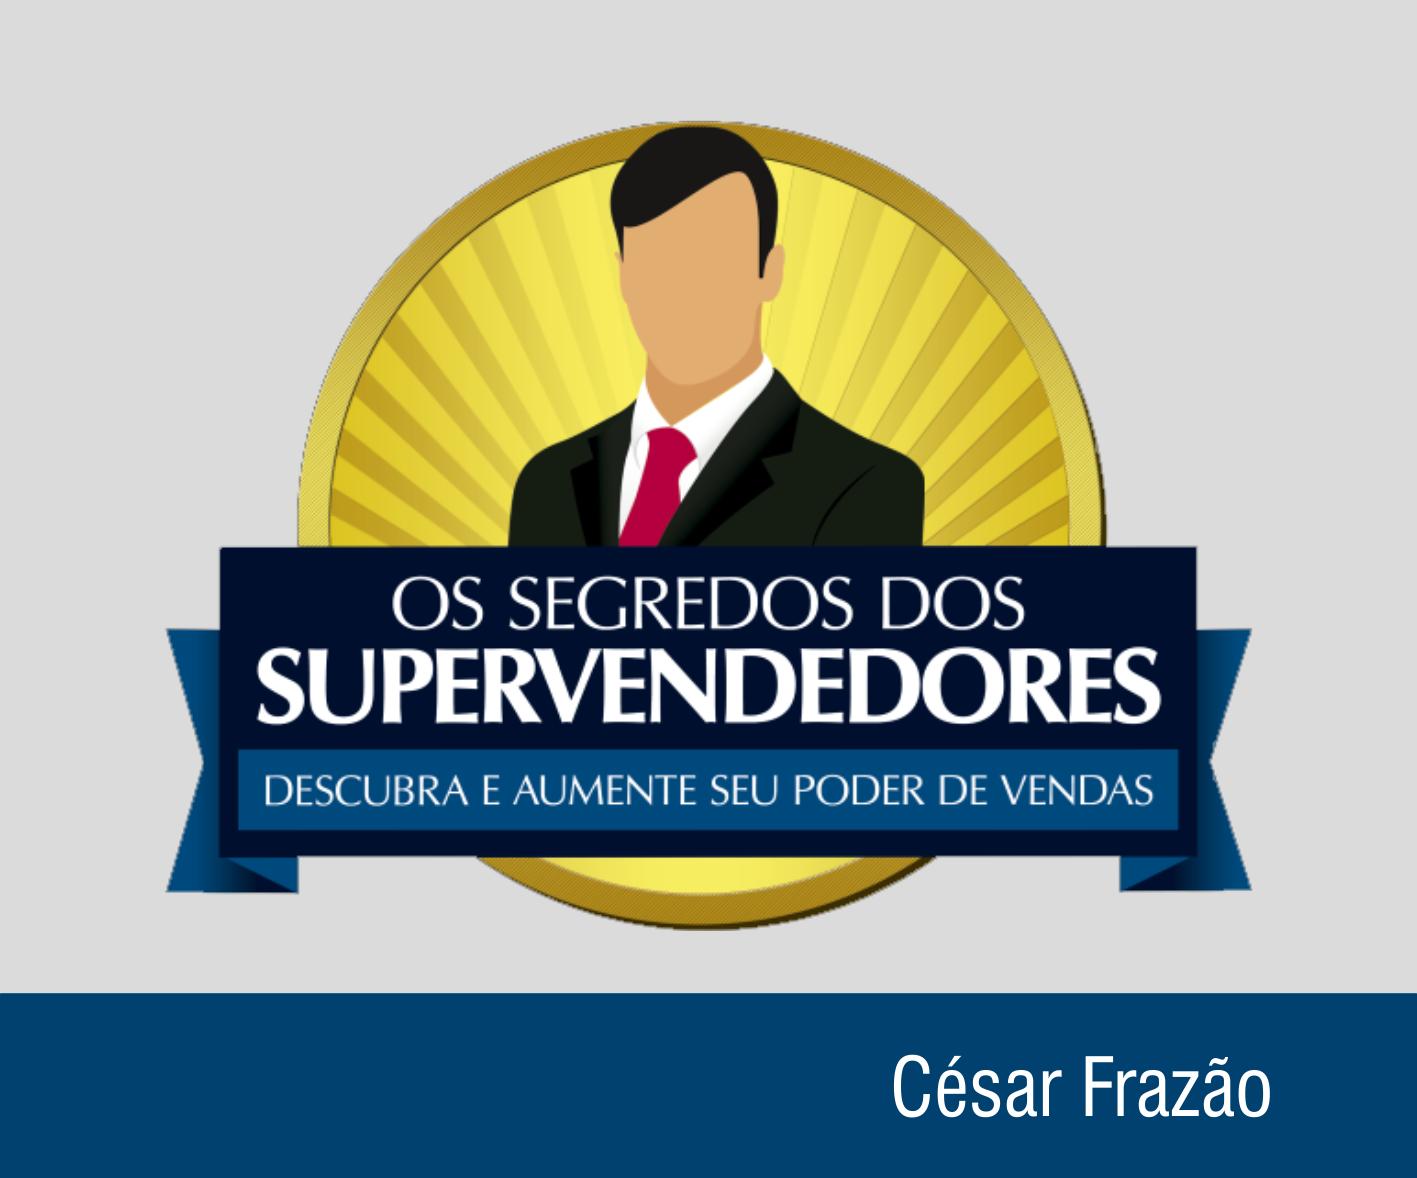 OS SEGREDOS DOS SUPER VENDEDORES – Curso de Vendas